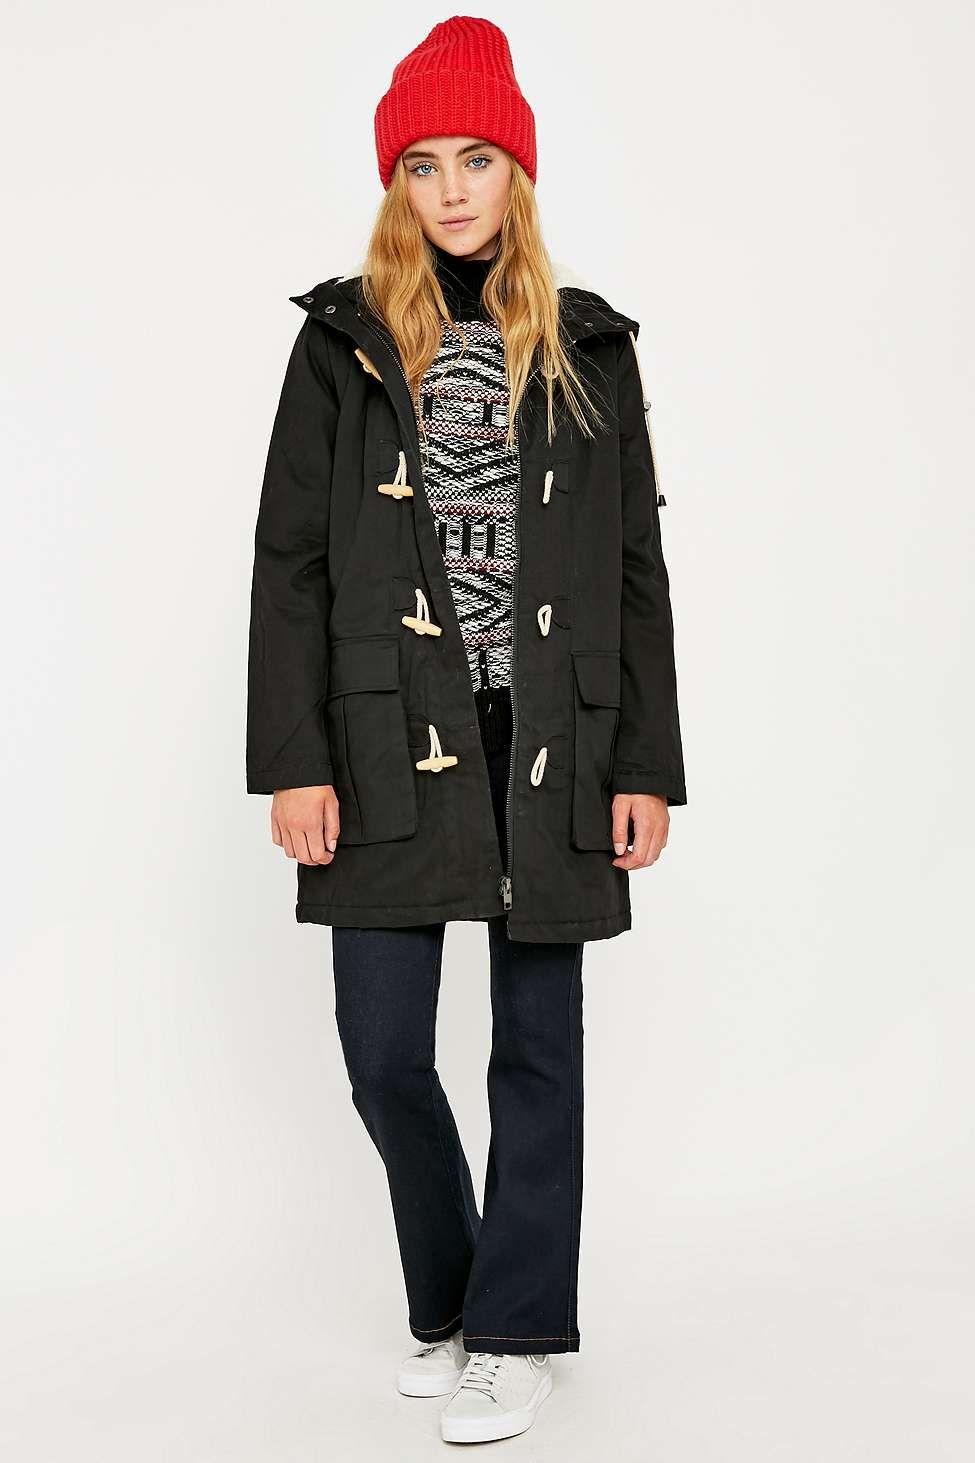 BDG Toggle Parka | Duffle coat, Coats and Winter